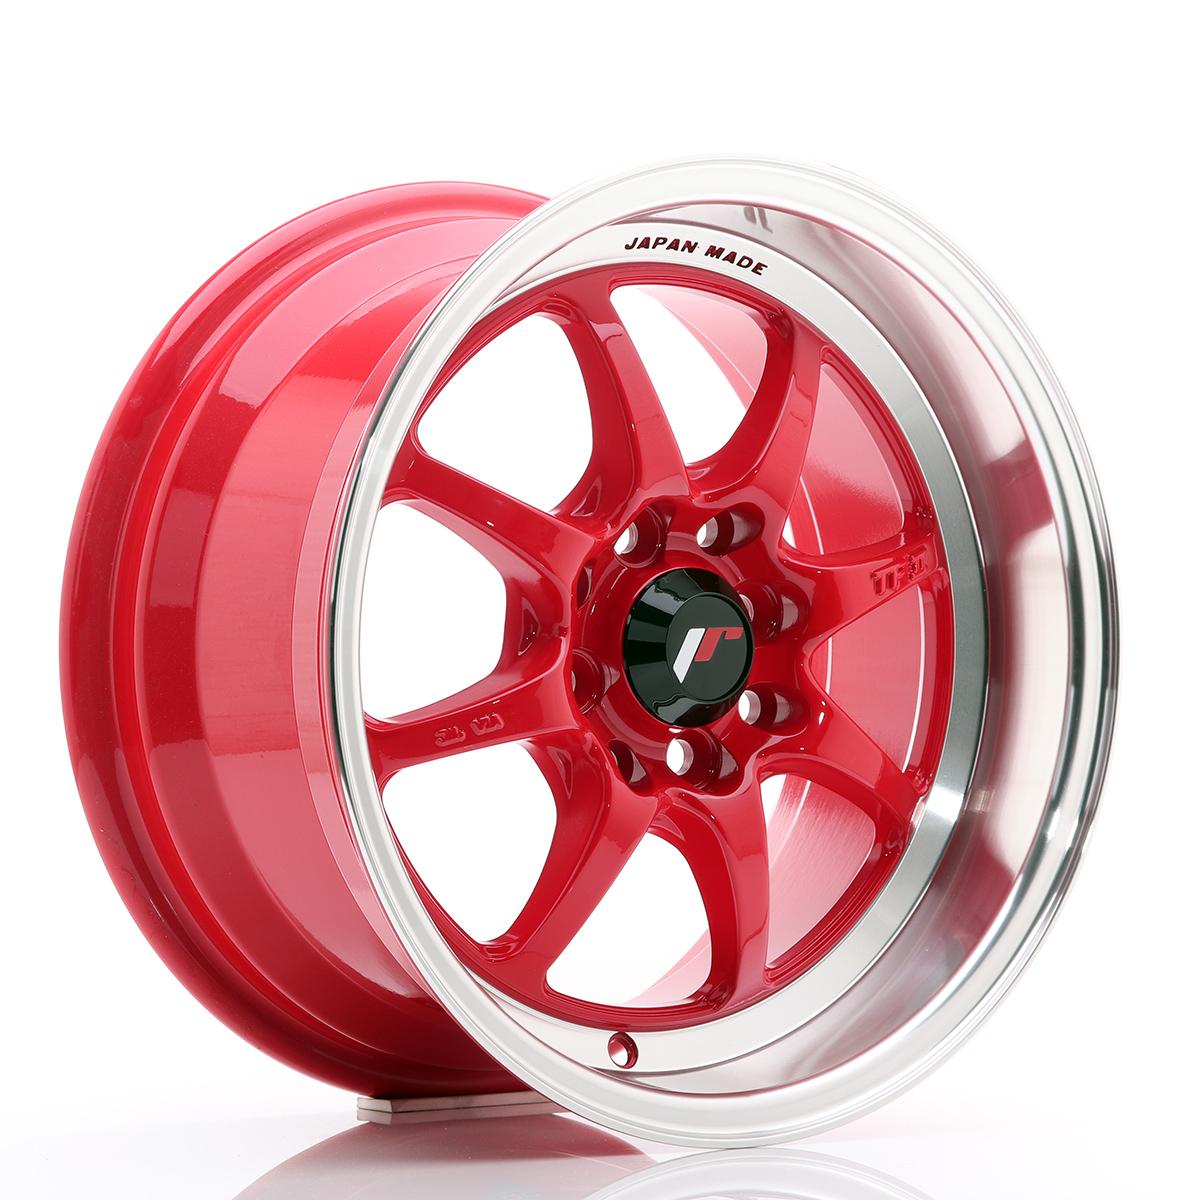 JAPAN RACING TFII 15x7.5 4x114.3 Red - GRUBYGARAGE - Sklep Tuningowy